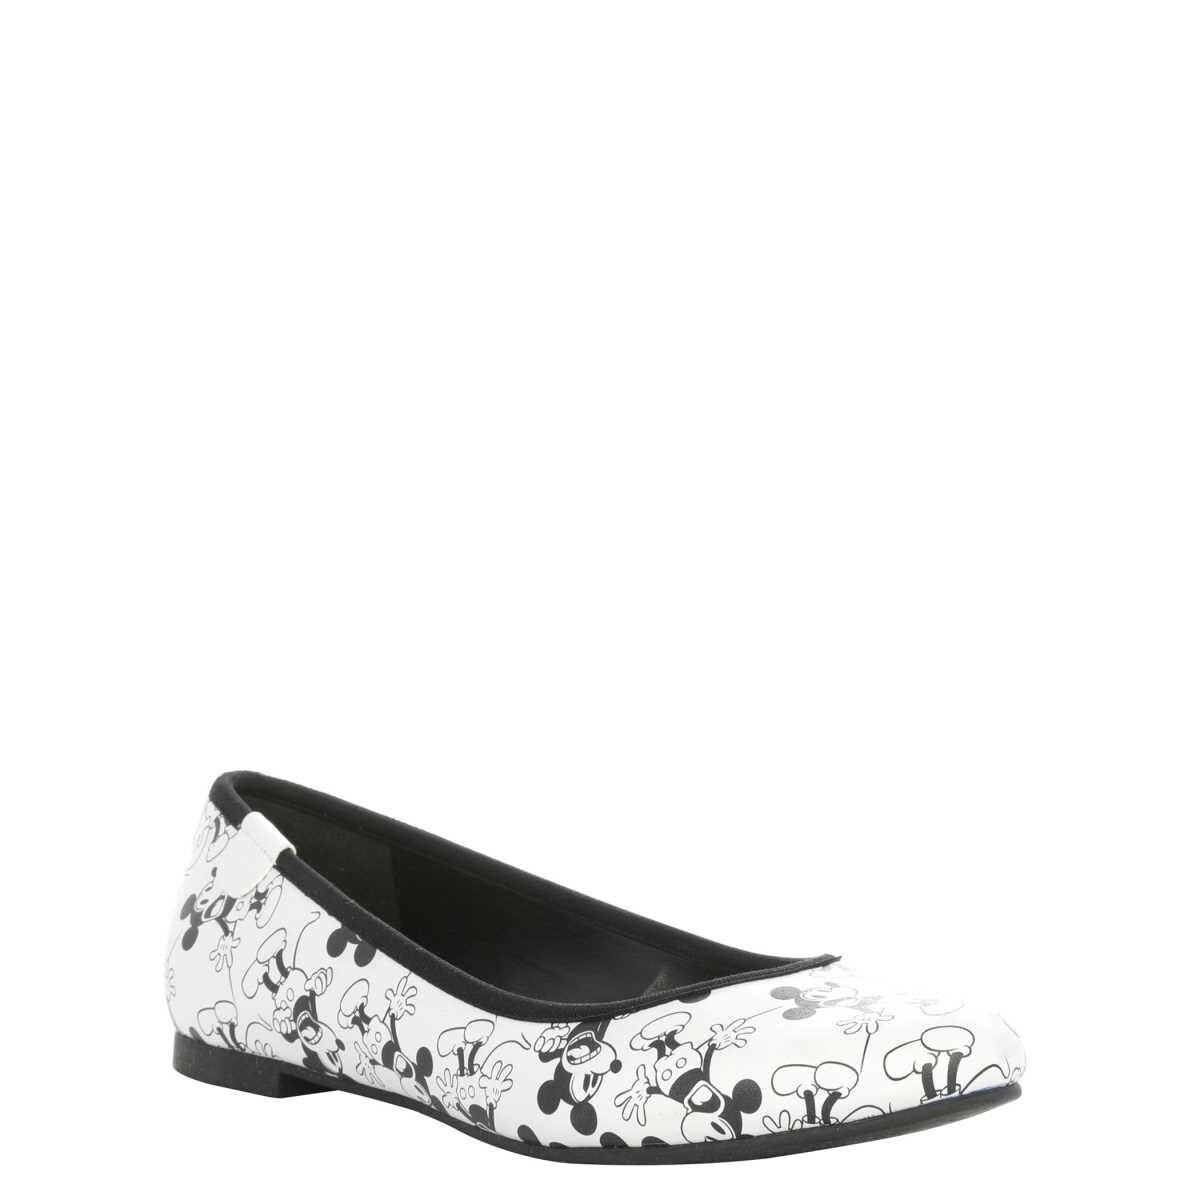 Zapatos Mickey Mouse Blanco Negeo